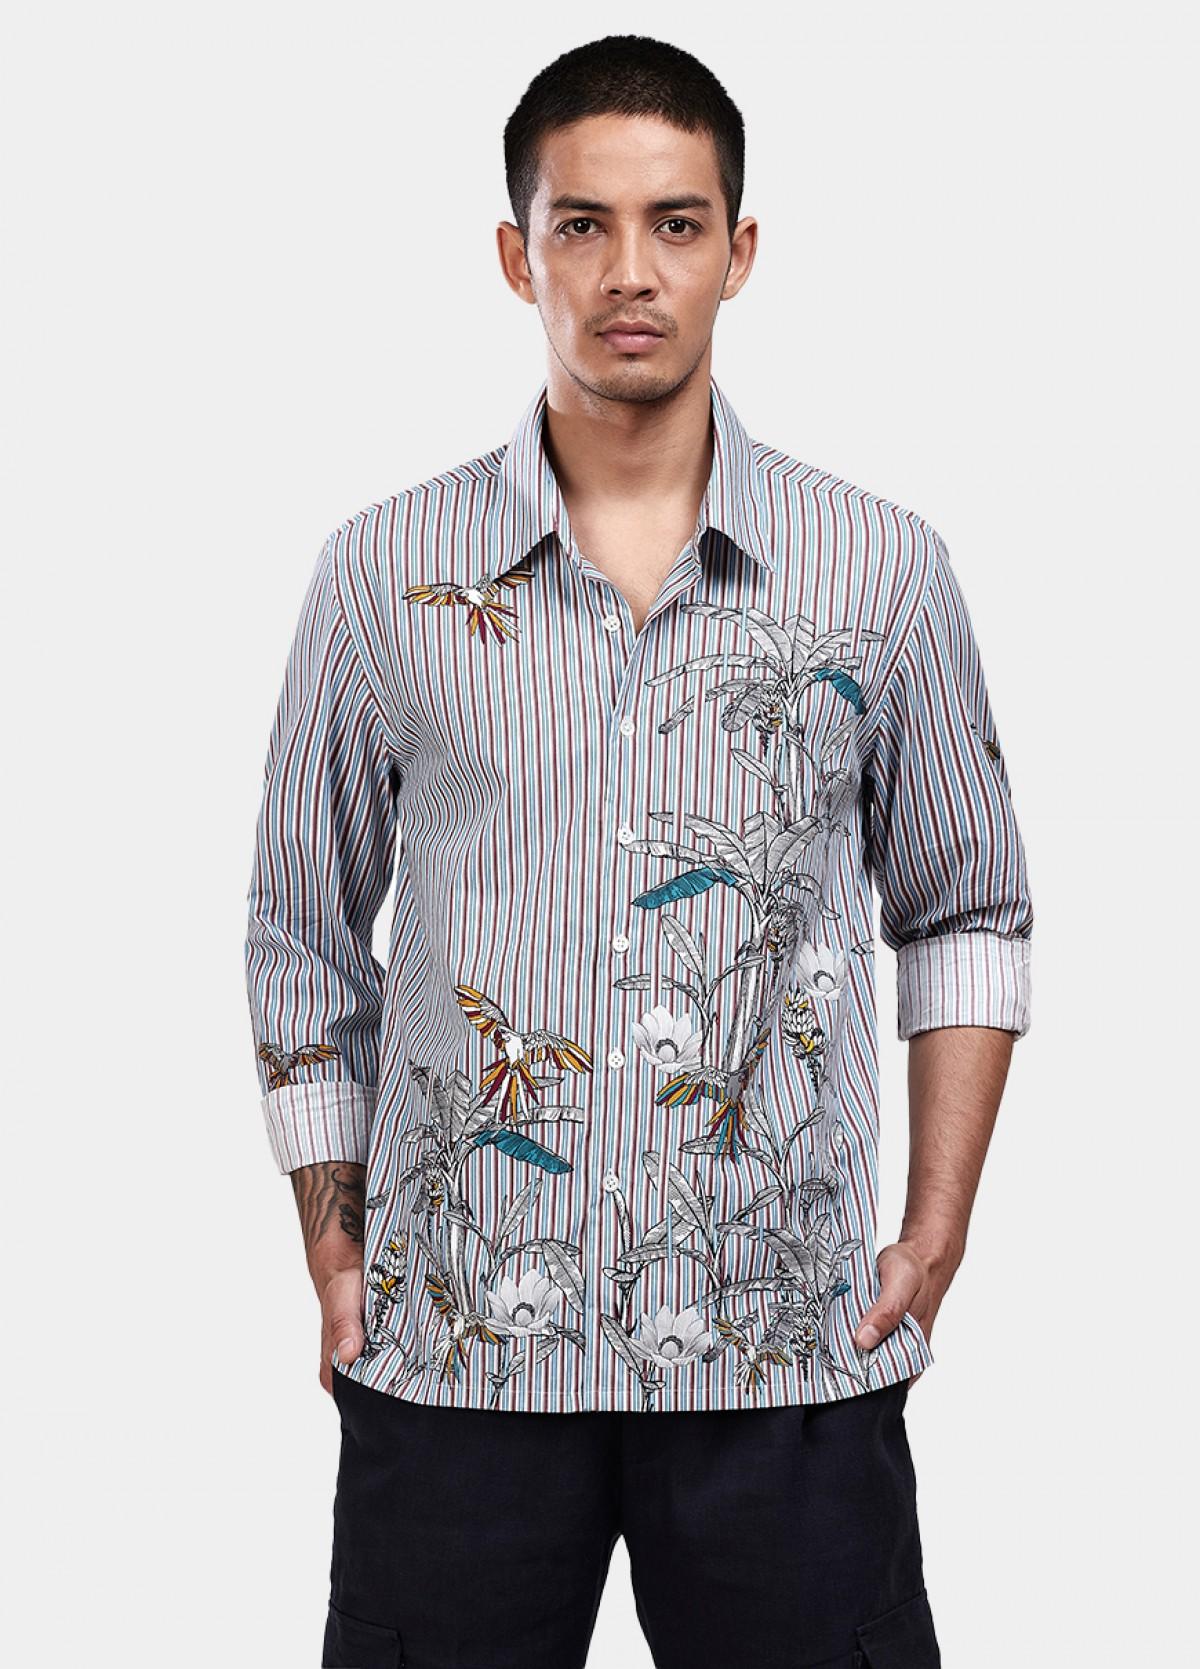 The Birds Eye Shirt